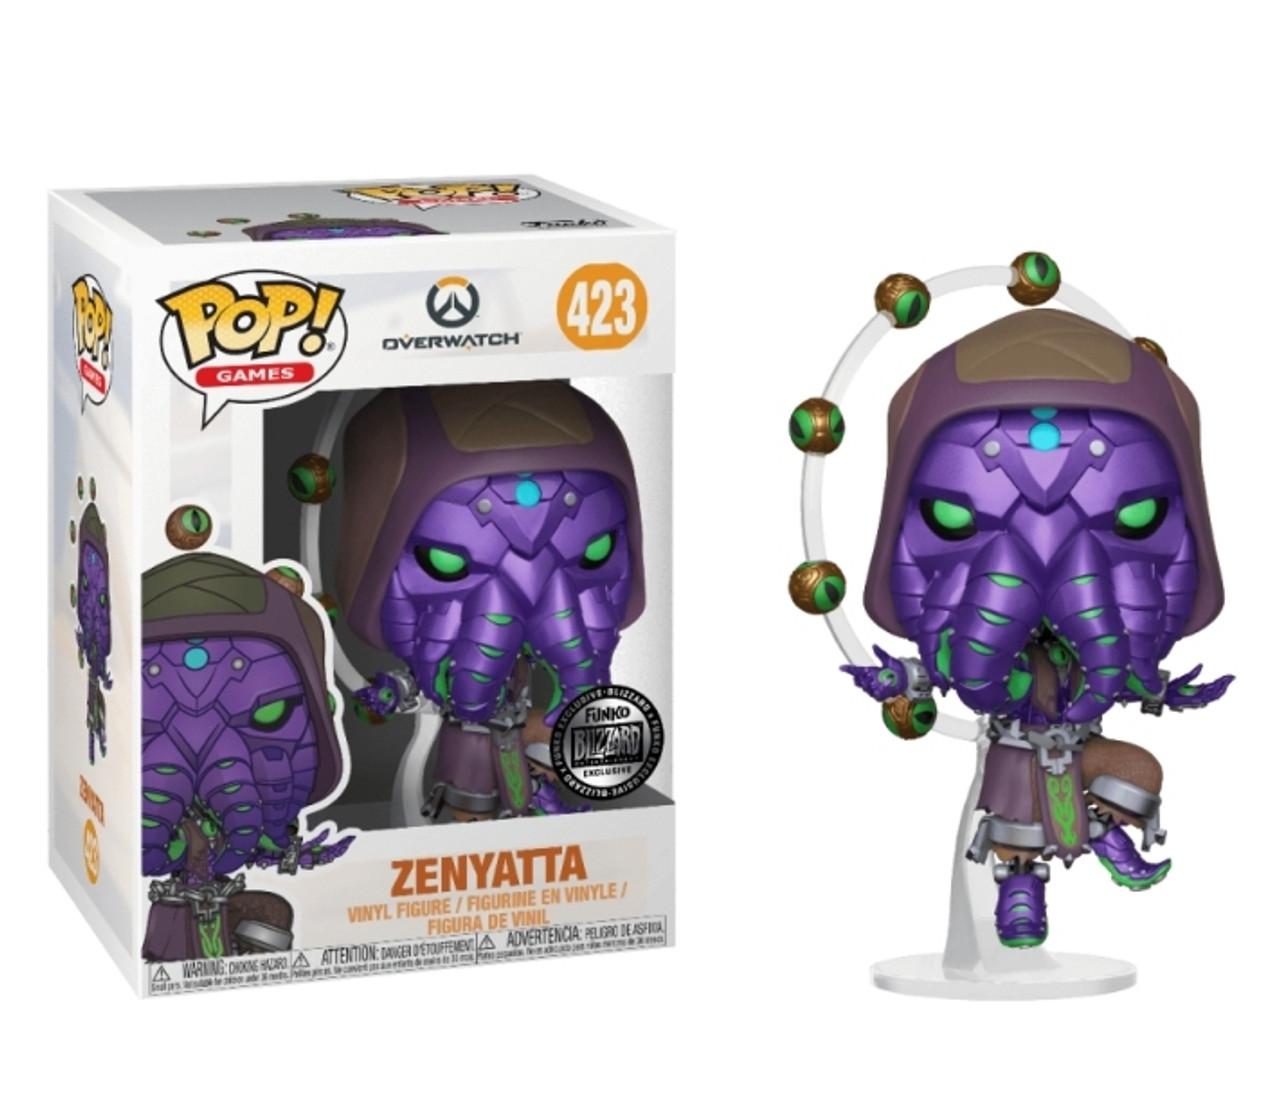 Halloween Pop.Zenyatta 423 Overwatch Halloween Cthulhu Cultist Blizzard Exclusive Funko Pop